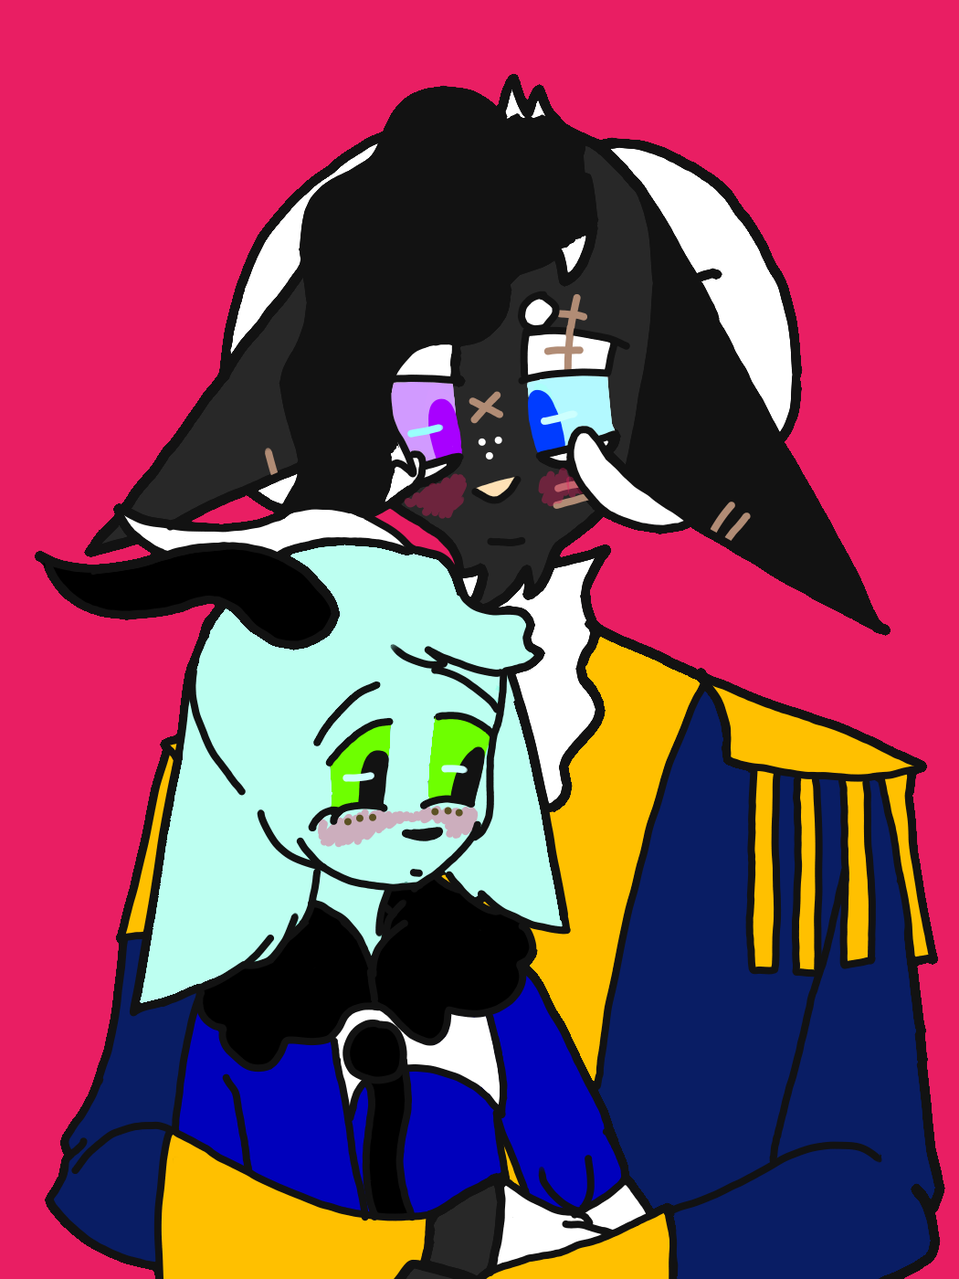 Sooty and Xander  Illust of HeadHonchoCodex medibangpaint Codex request Emo furry boy dark HeadHonchoCodex custom oc